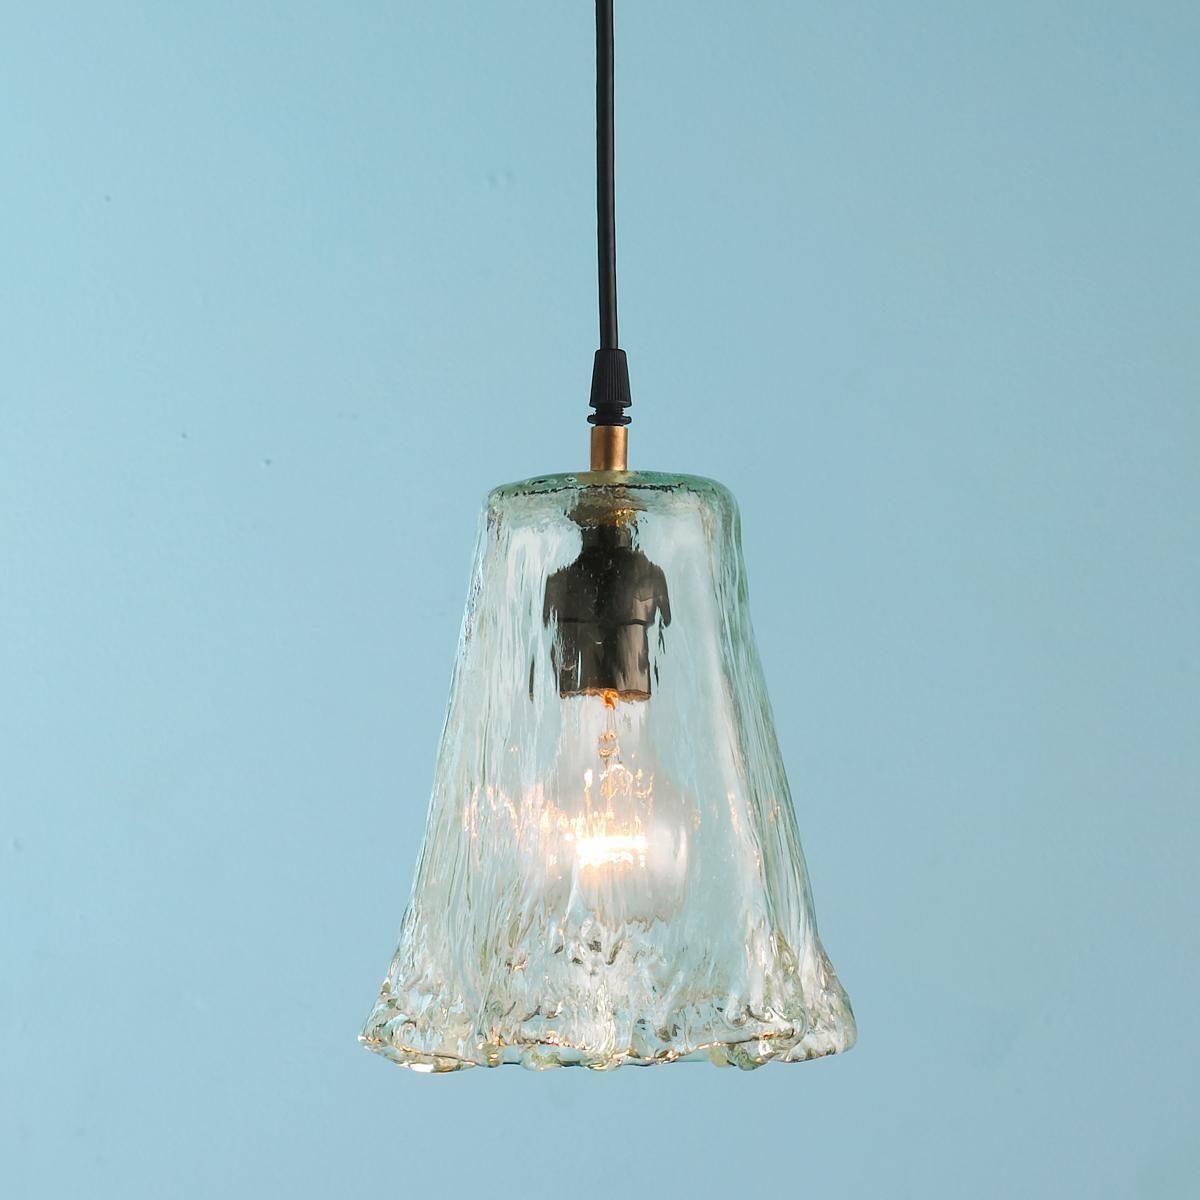 Recycled Ruffle Glass Pendant Glass Pendant Shades Glass Shade Pendant Light Glass Pendant Light